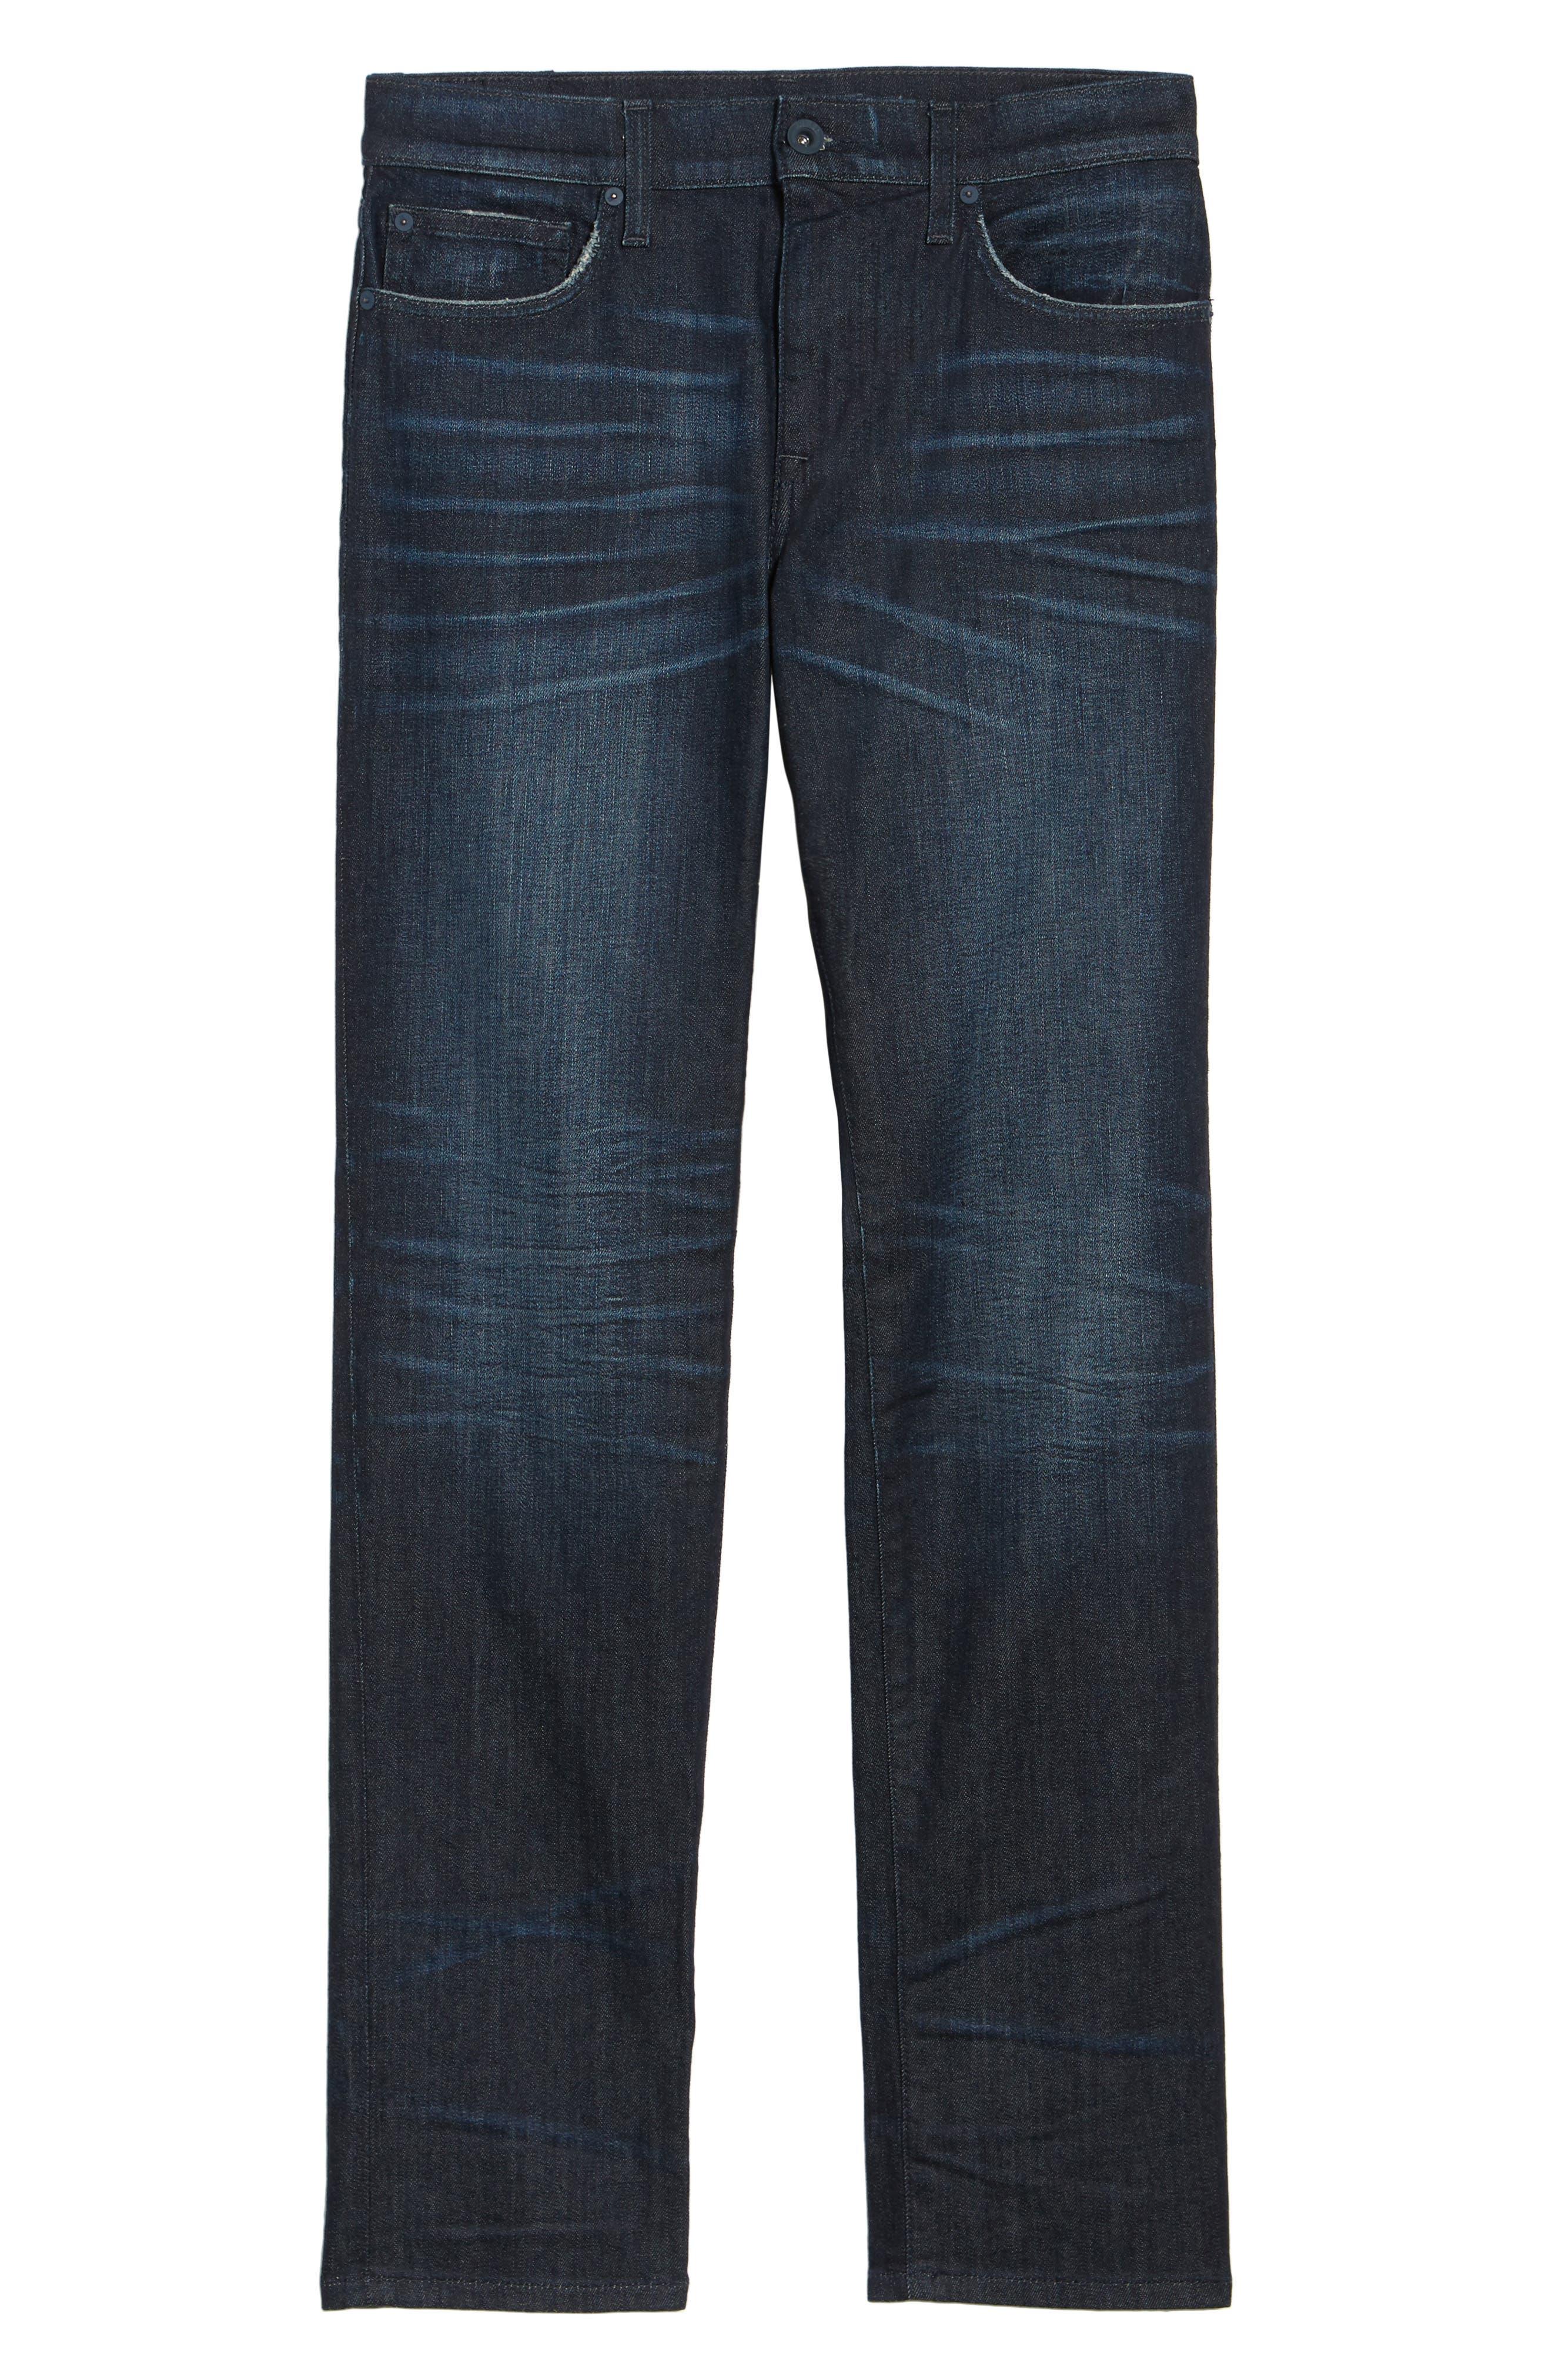 Brixton Slim Straight Fit Jeans,                             Alternate thumbnail 6, color,                             405